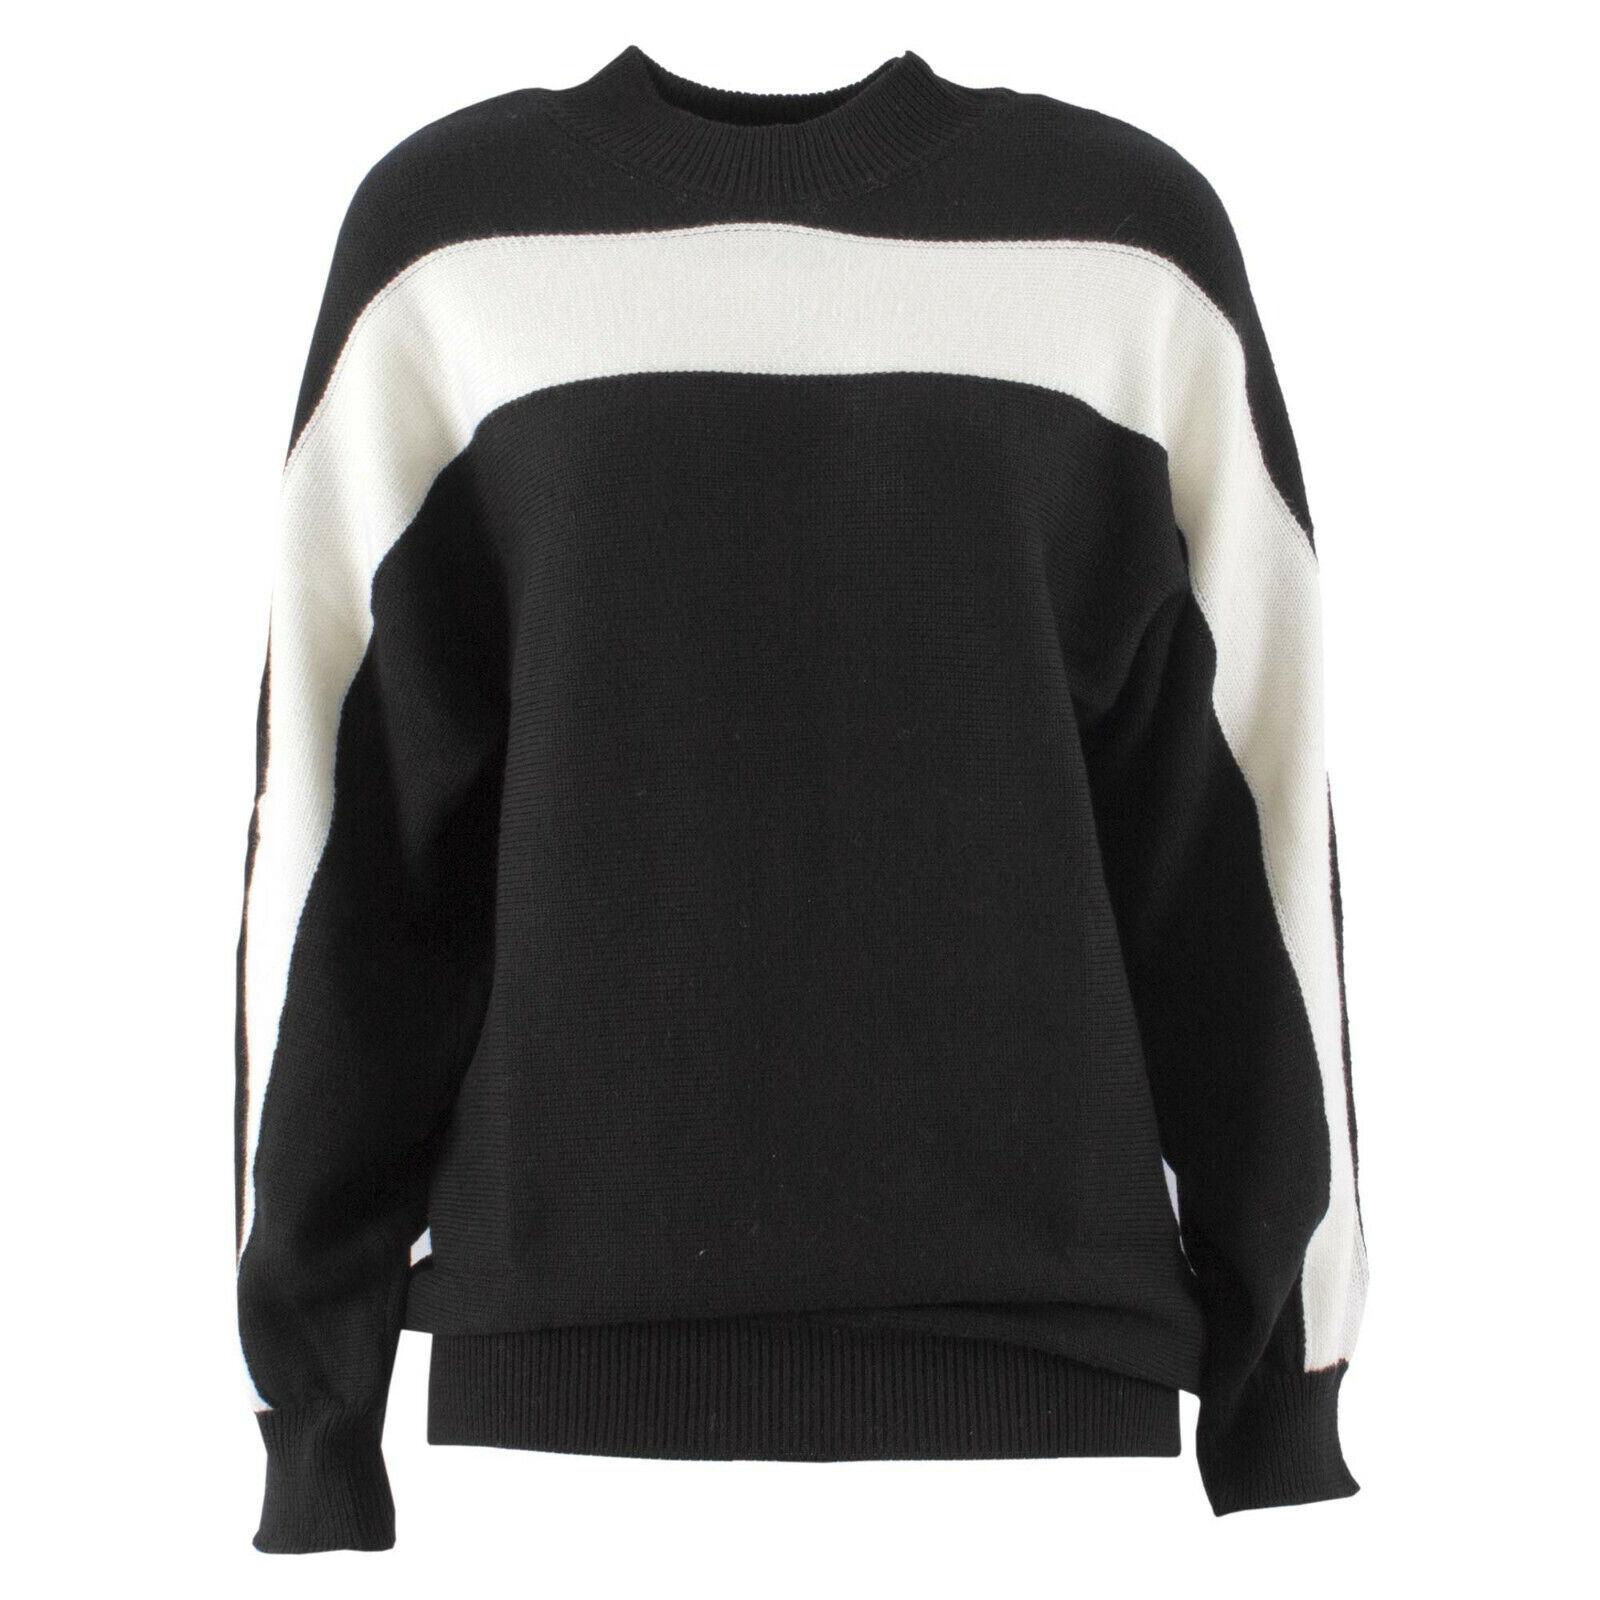 MANDALA Damen Oversize Yoga-Pullover SH12KN05 Schwarz / S (36) / Jumper